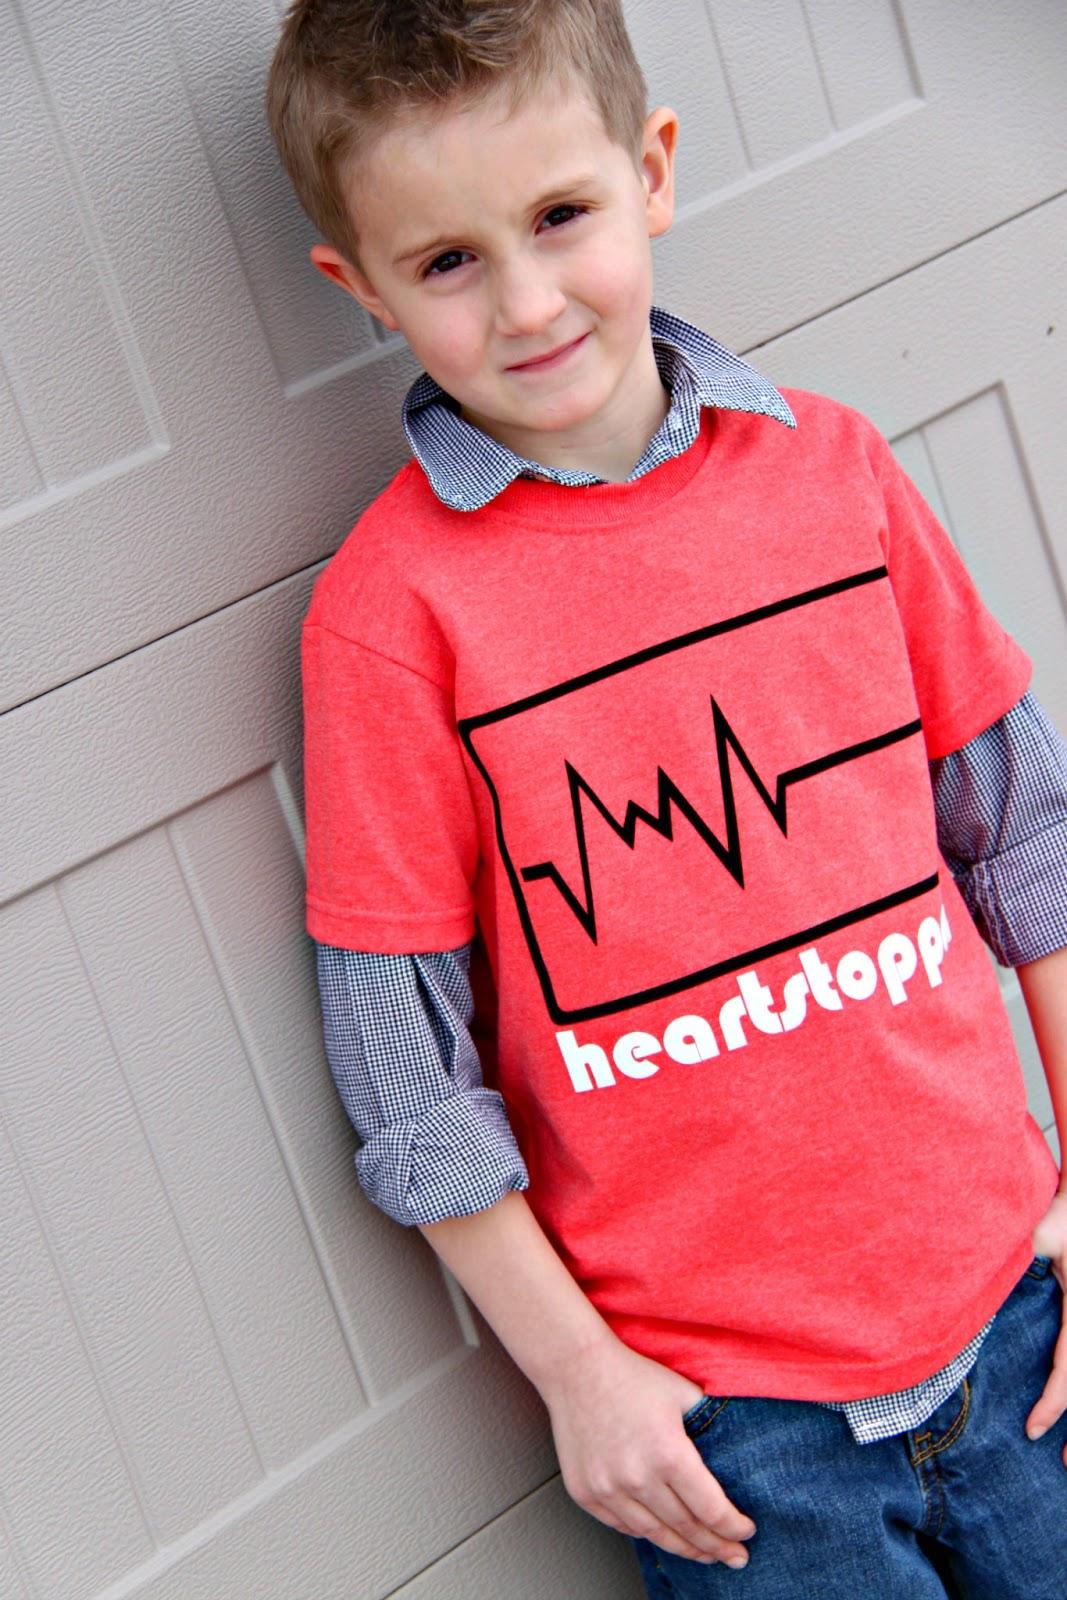 heartstopper valentines day t shirt - Boys Valentines Day Shirts